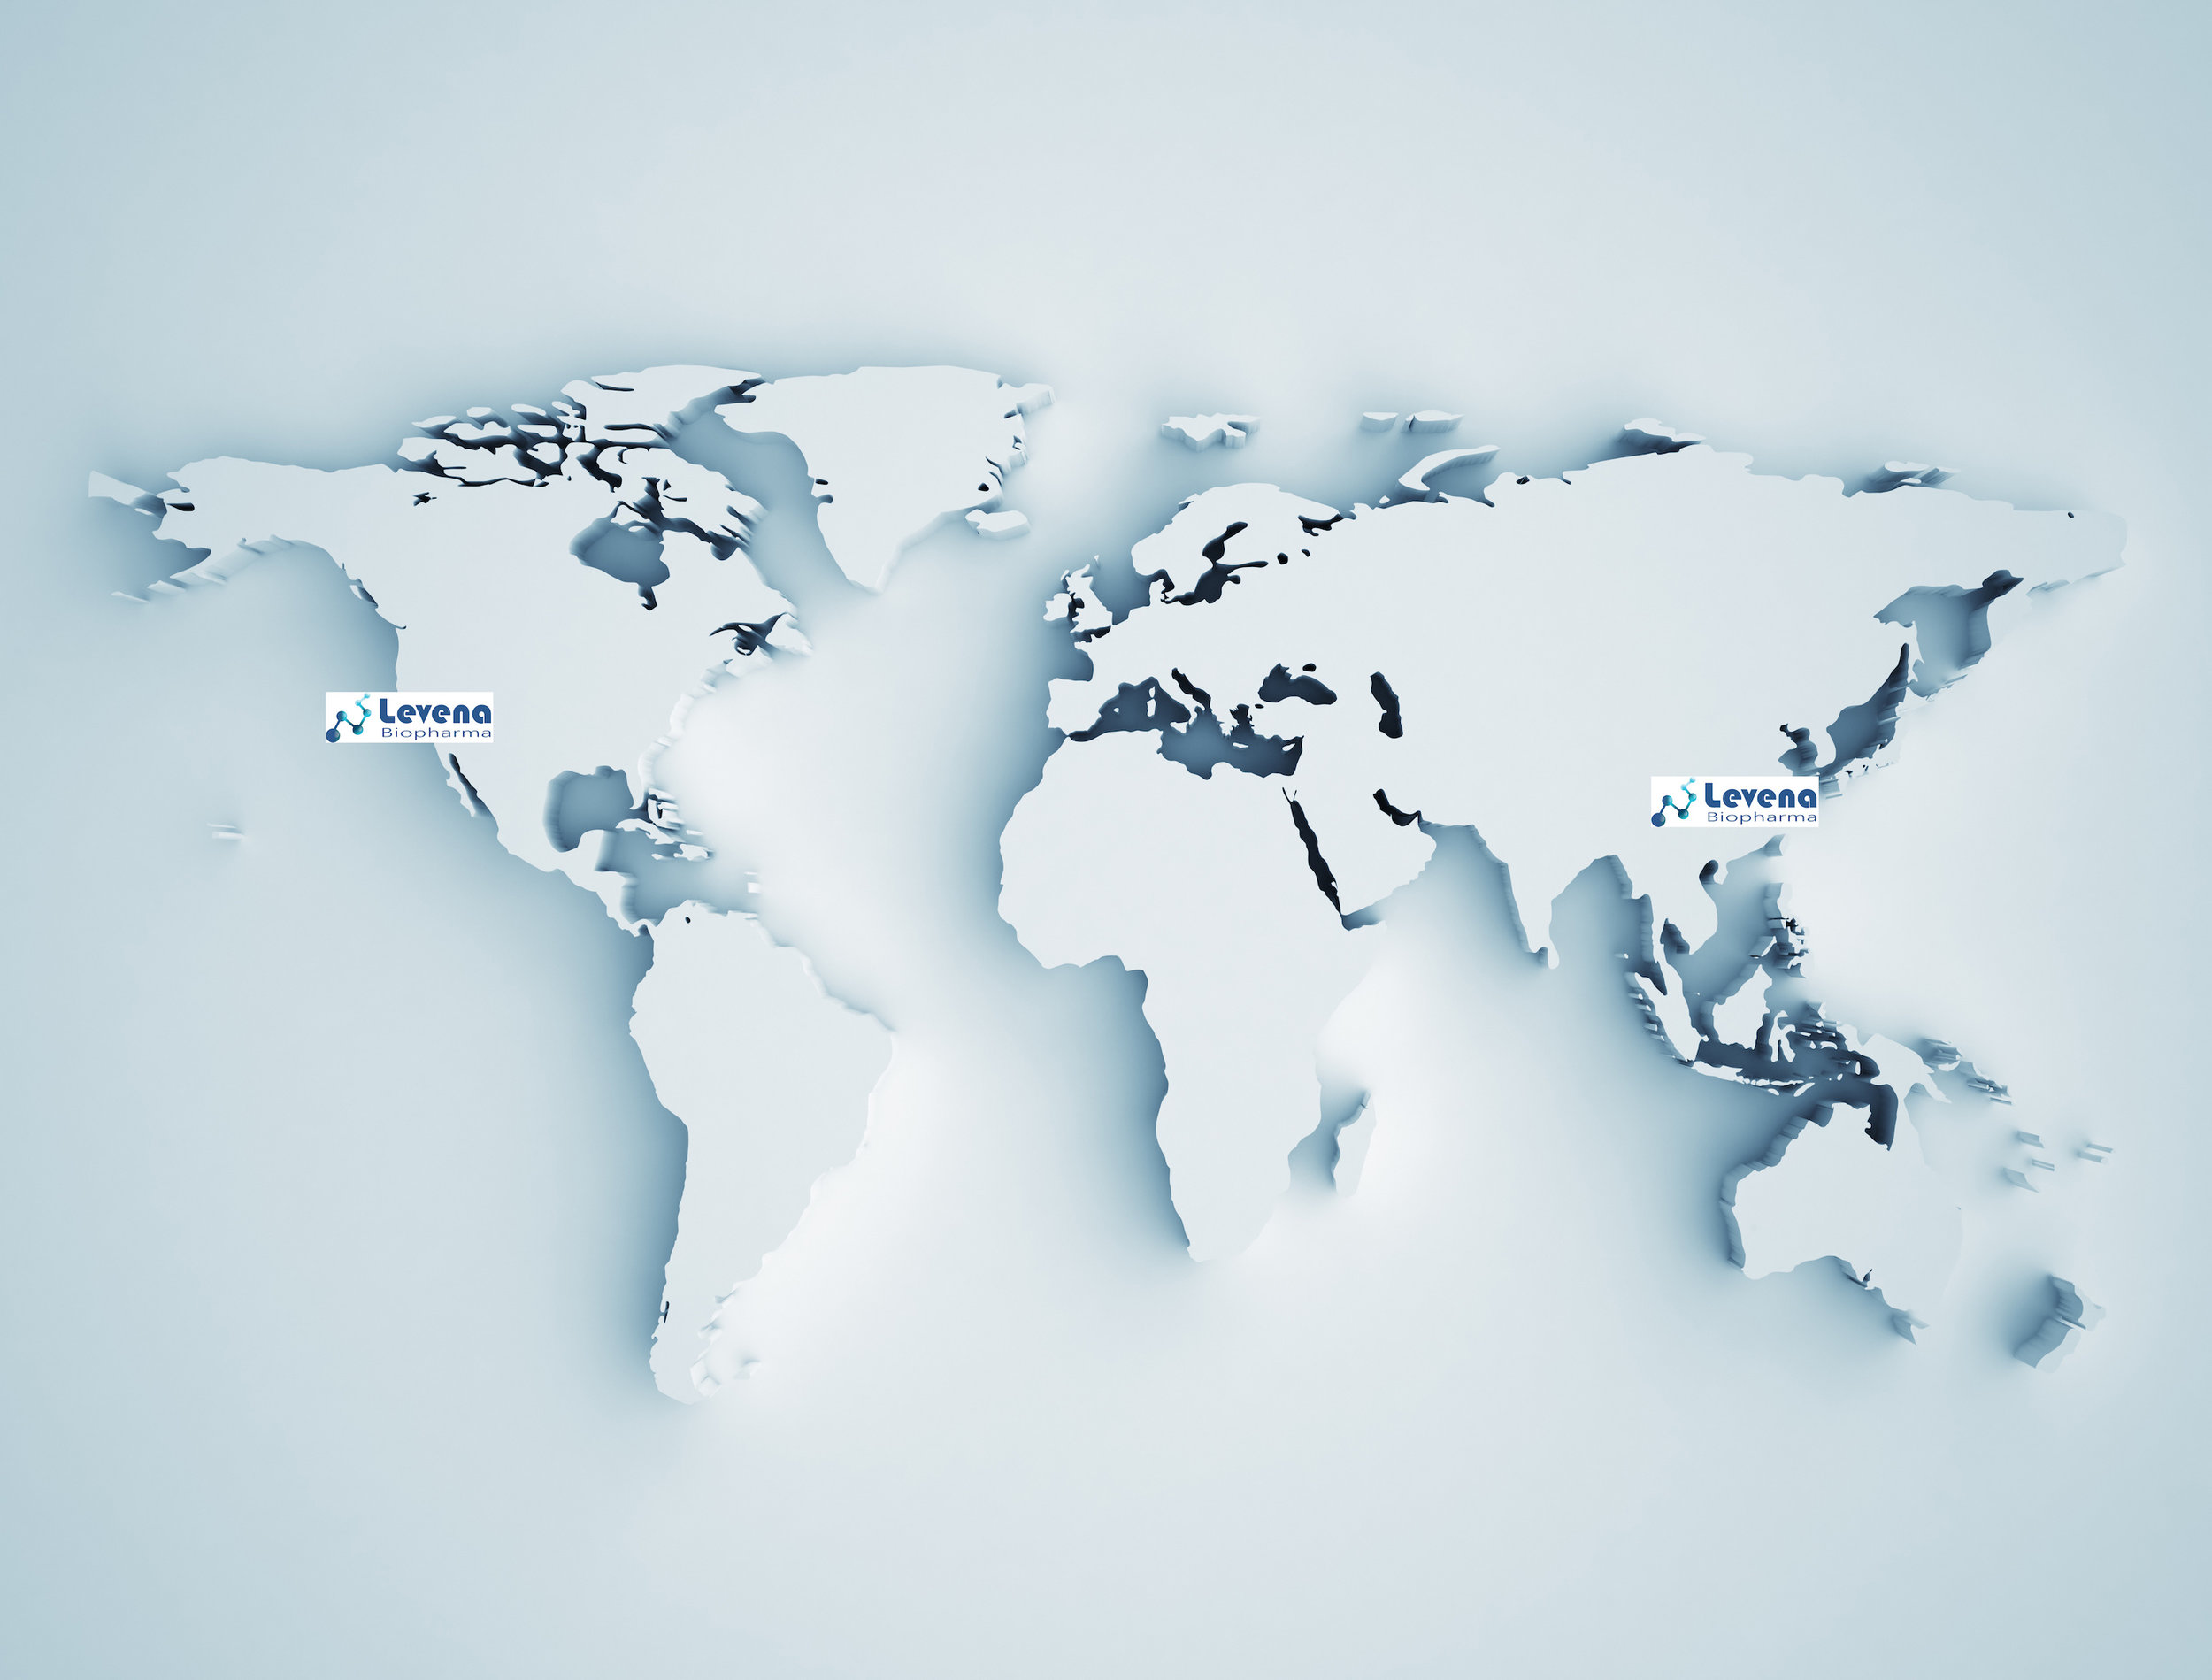 Levena globe map.jpg